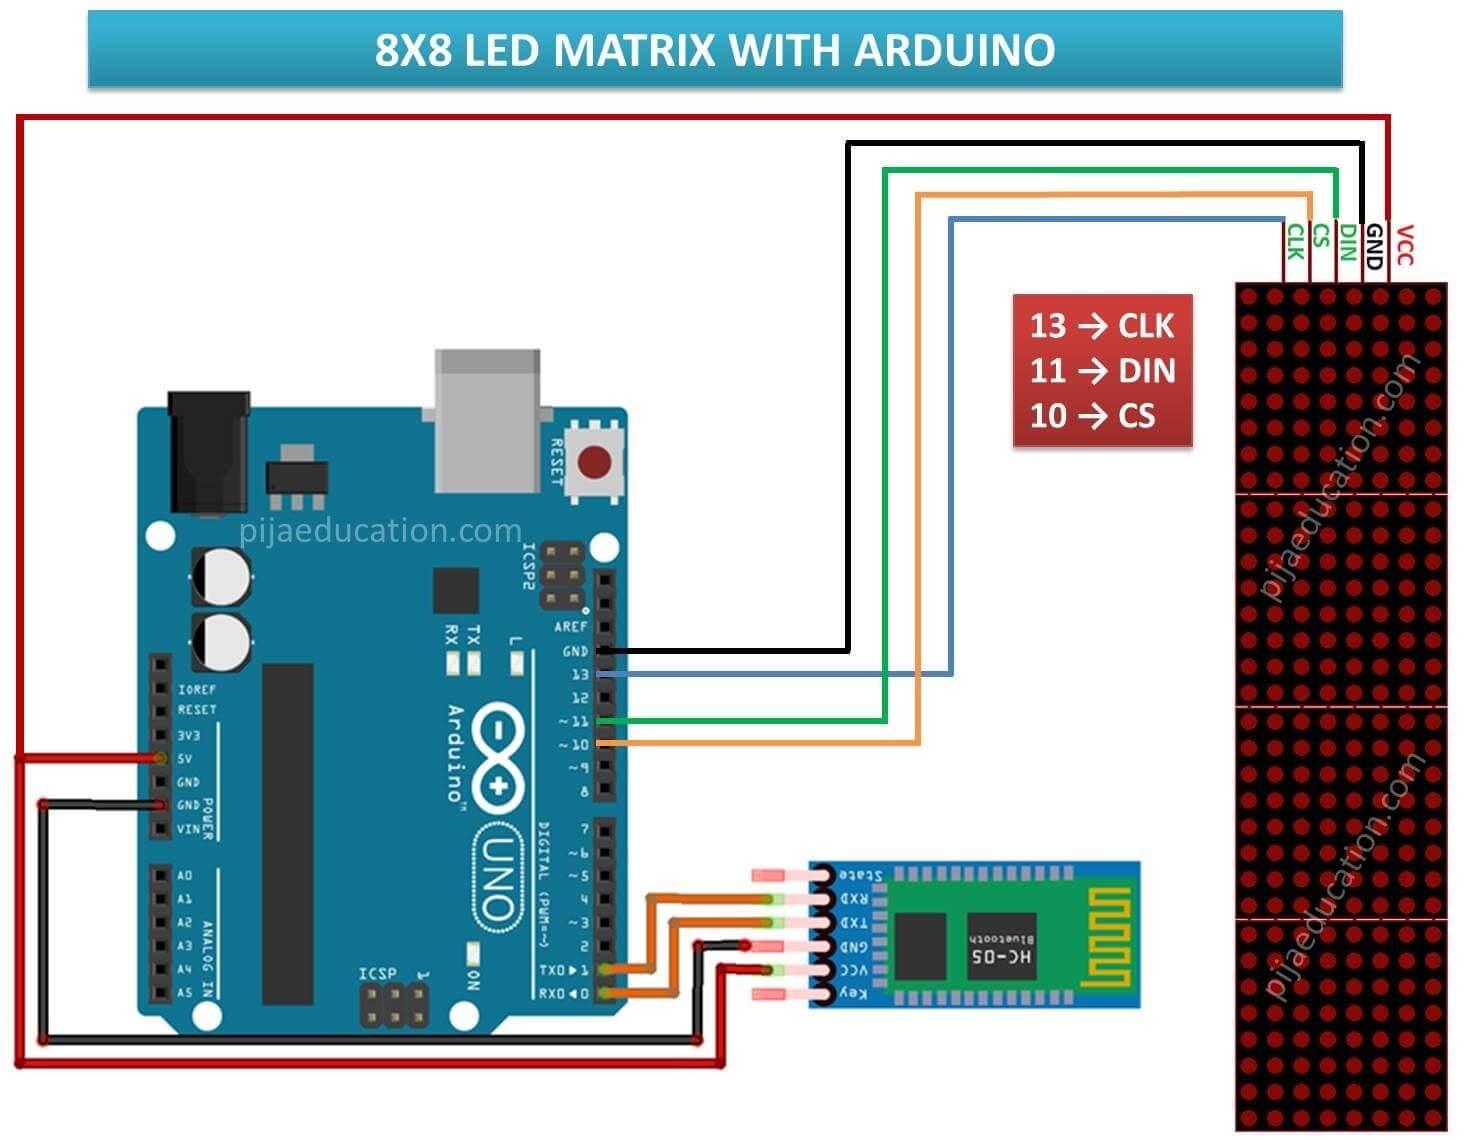 8X8 LED MATRIX WITH ARDUINO